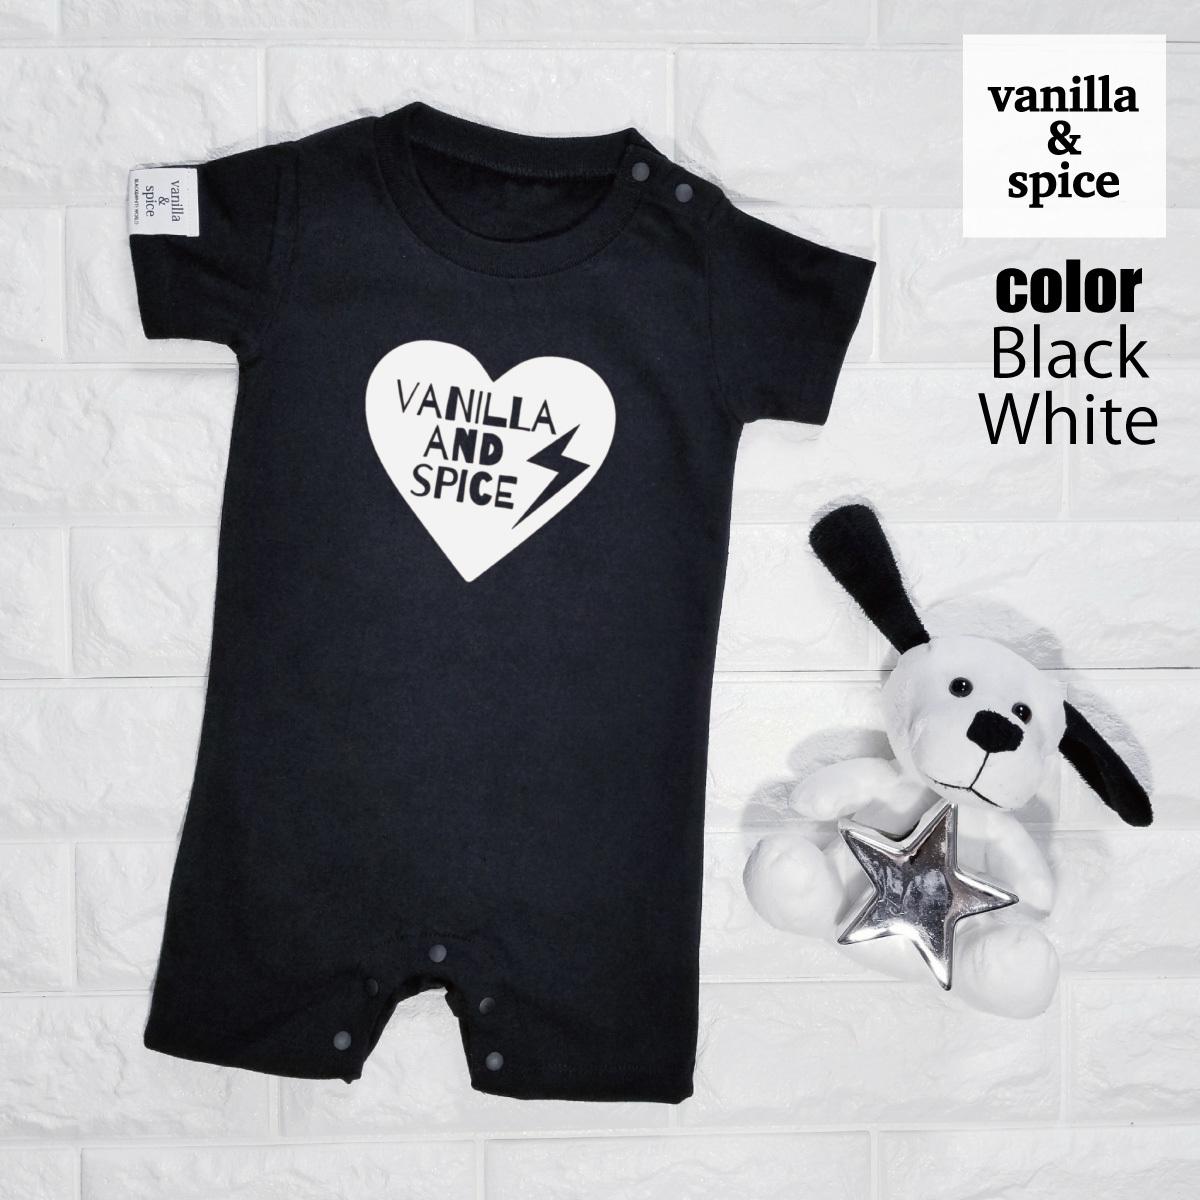 f34ad01172f77 ベビー 半袖 ロンパース ショート Heart Logo ハート ロゴ サンダー 雷 プリント 赤ちゃん 出産祝い ベビー服  vanilla spice バニラ&スパイス